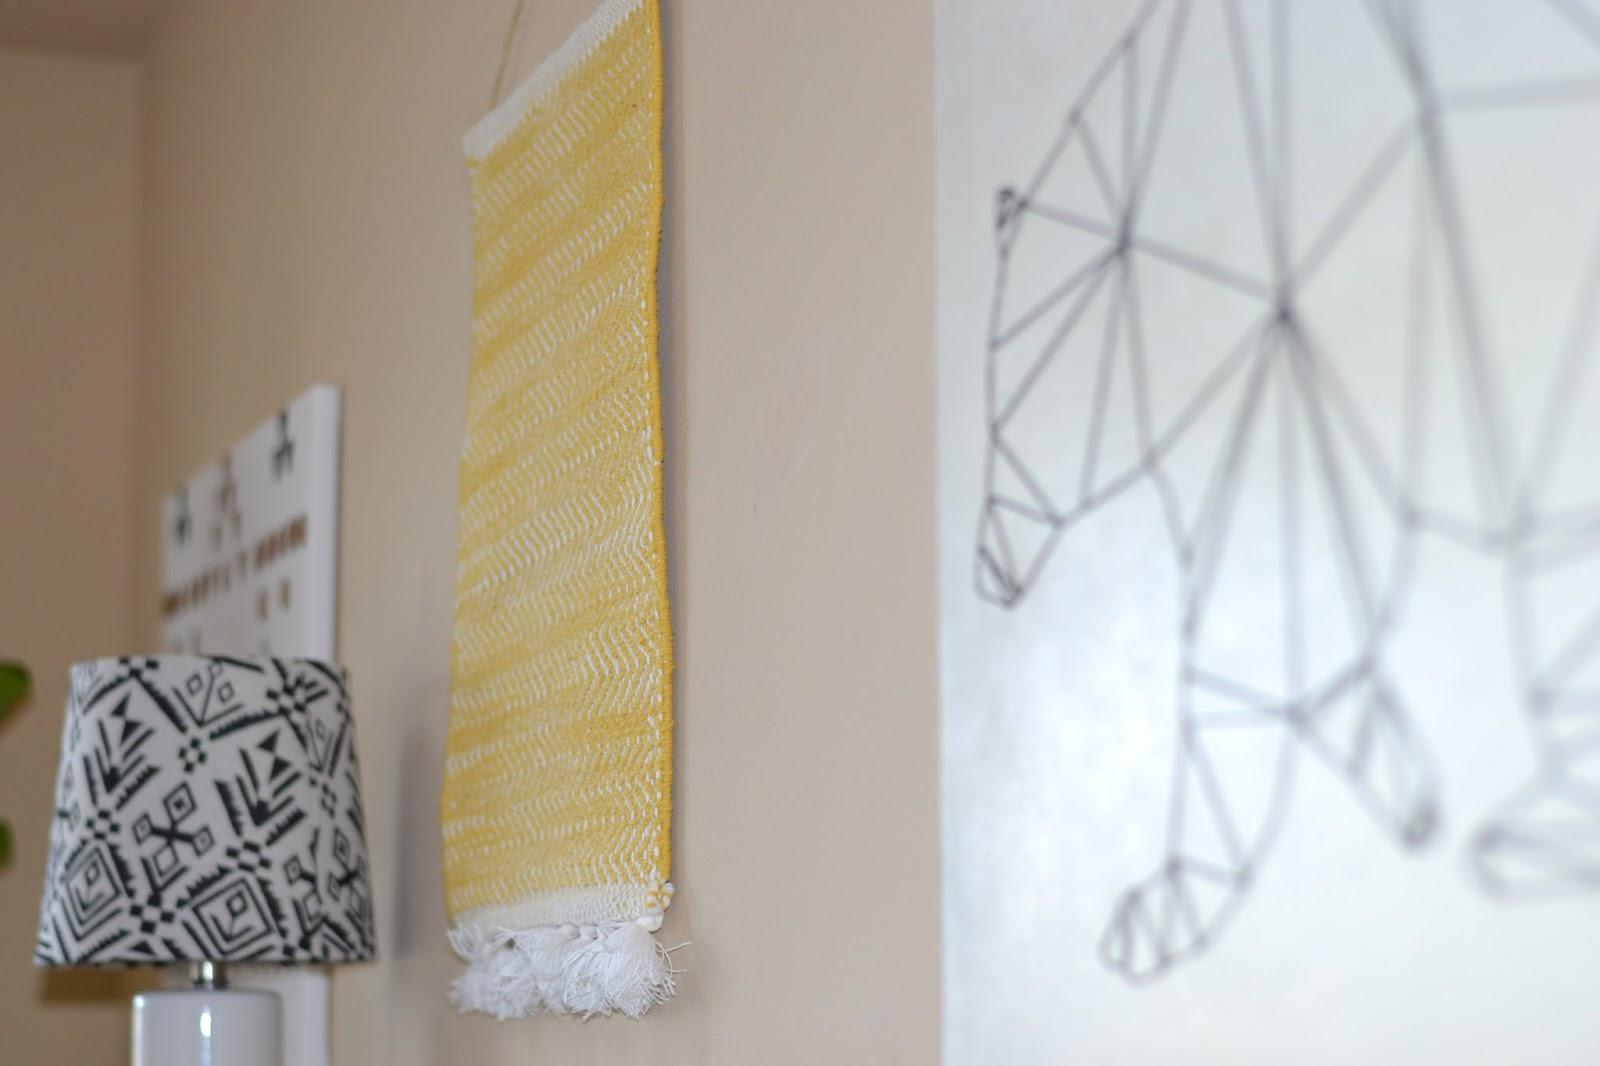 Best large wall art bohemian style tribal canvas Baylor DIY